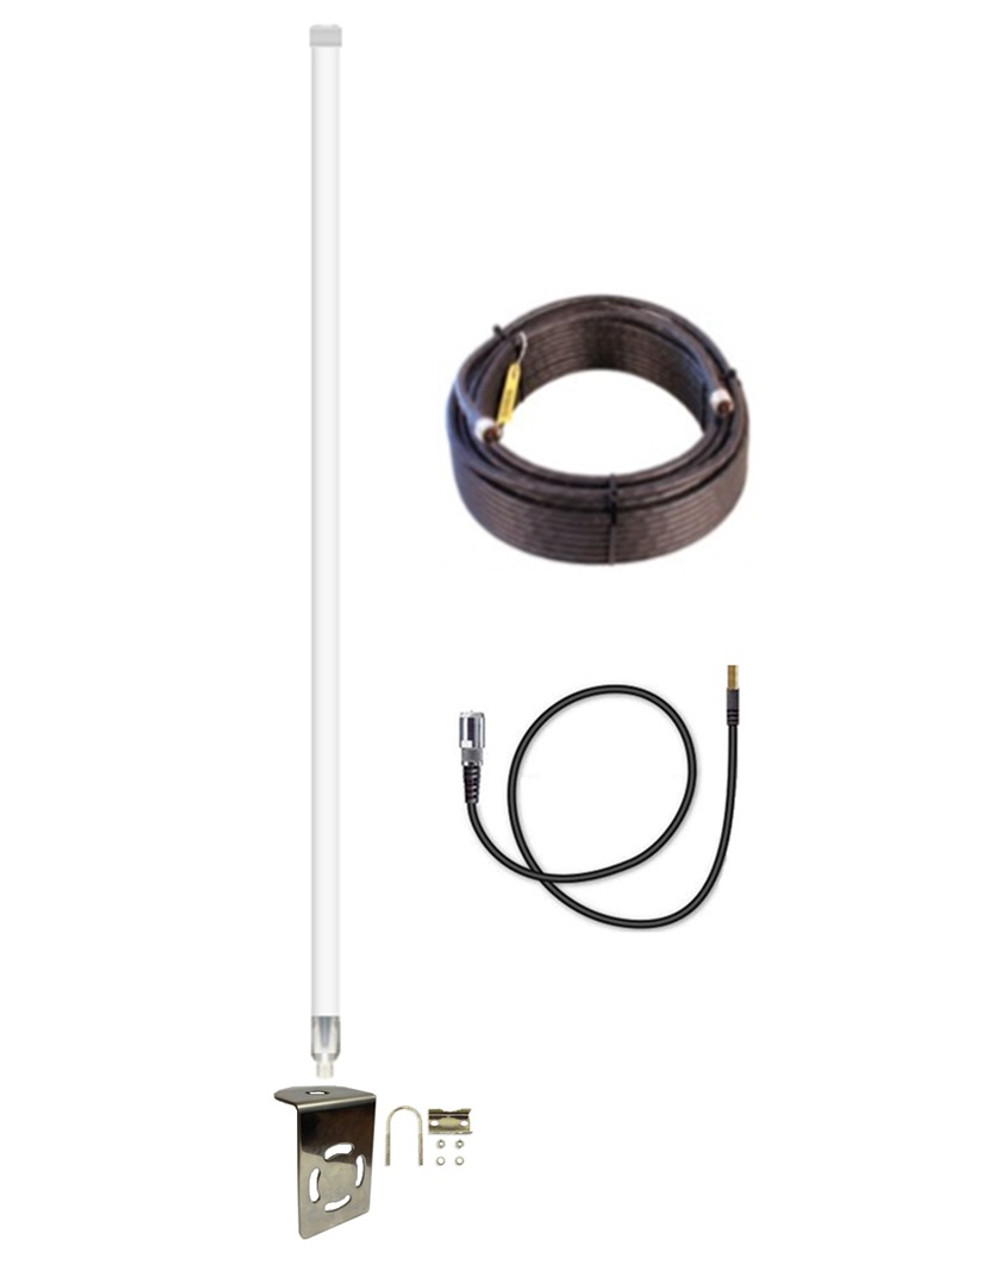 12dB Fiberglass 4G LTE XLTE Antenna Kit For AT&T NETGEAR Unite 781S w/ Cable Length Options